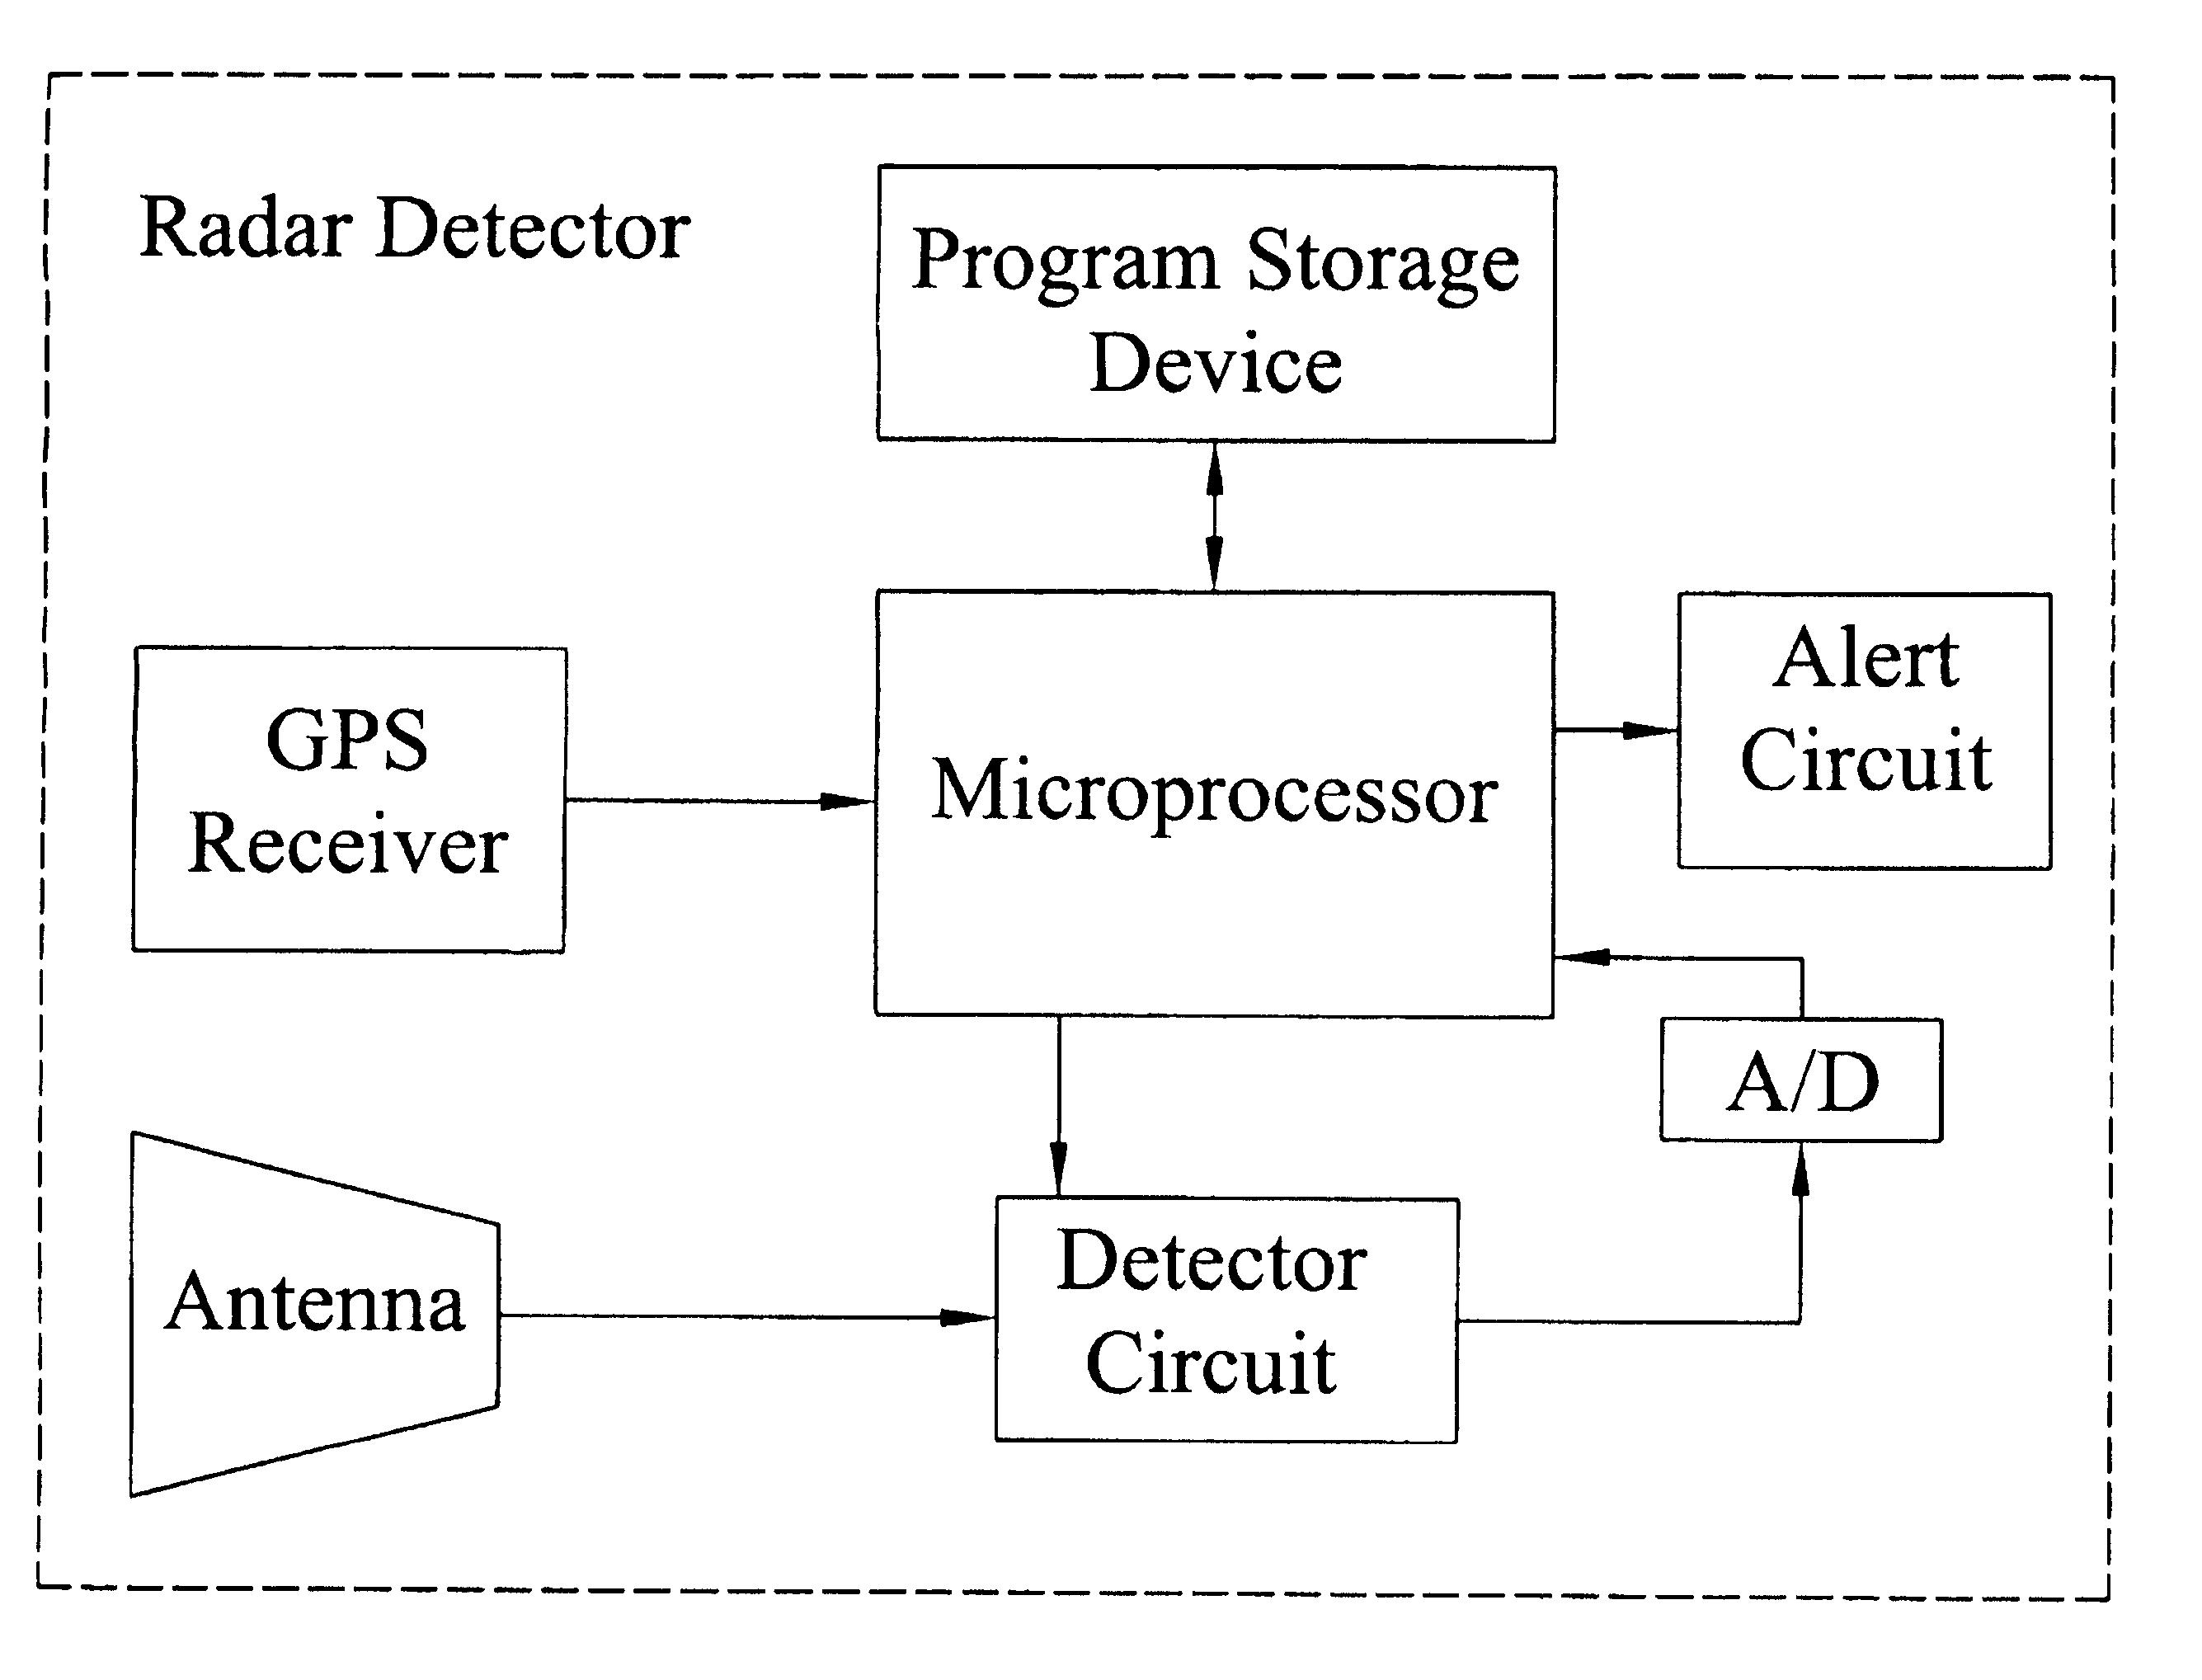 USRE040653-20090310-D00000 Radar Detection Schematic Diagram on computer circuit board, sony tv, hvac system, power amplifier, cb radio, am tube radio, samsung lcd tv, ic stk 0105,